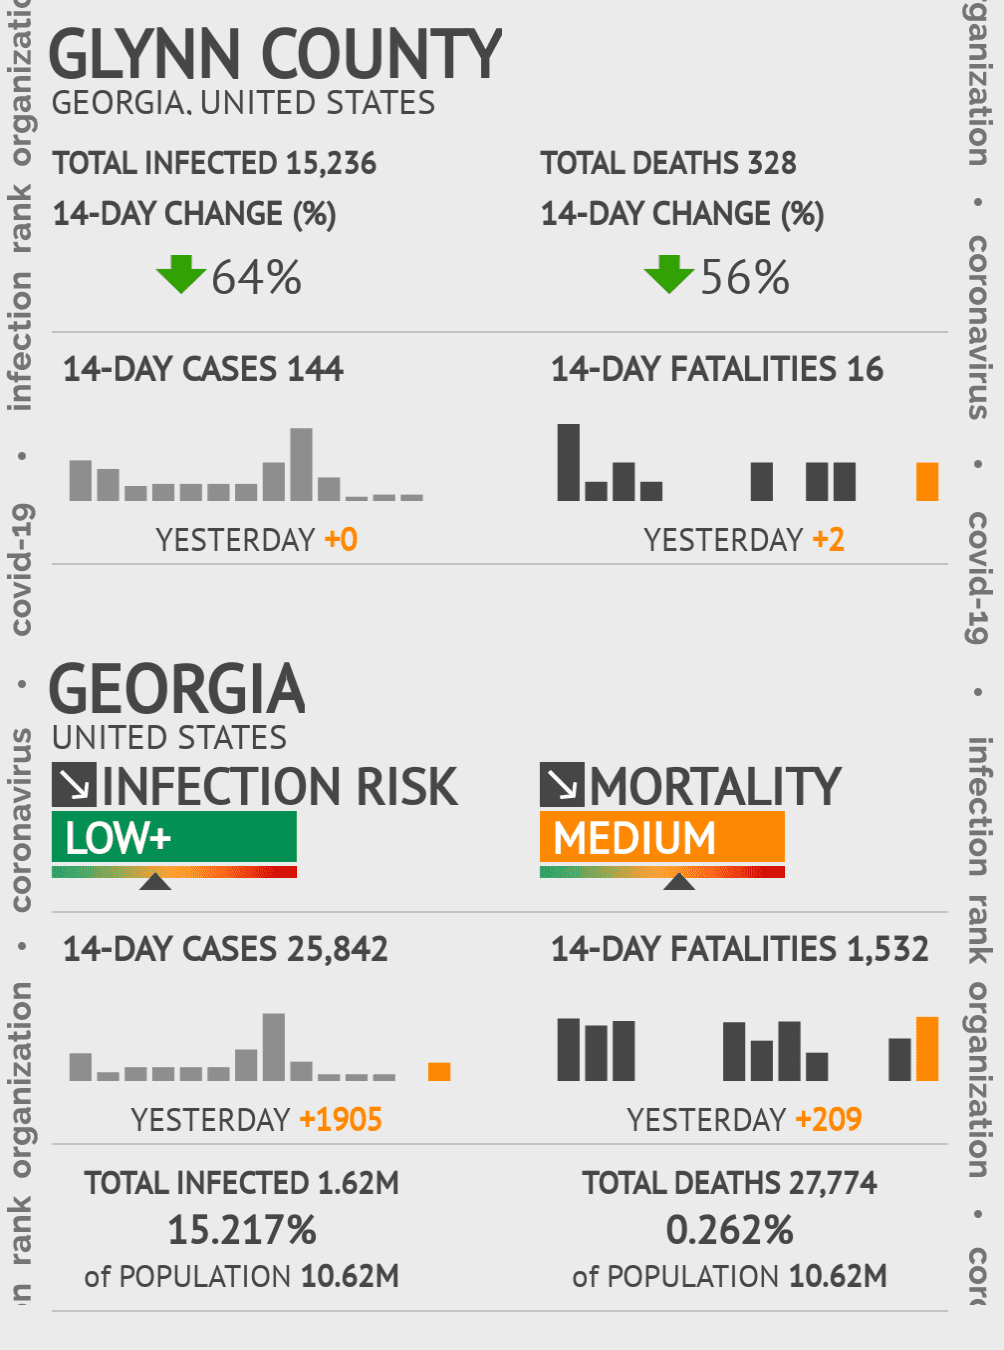 Glynn County Coronavirus Covid-19 Risk of Infection on November 25, 2020